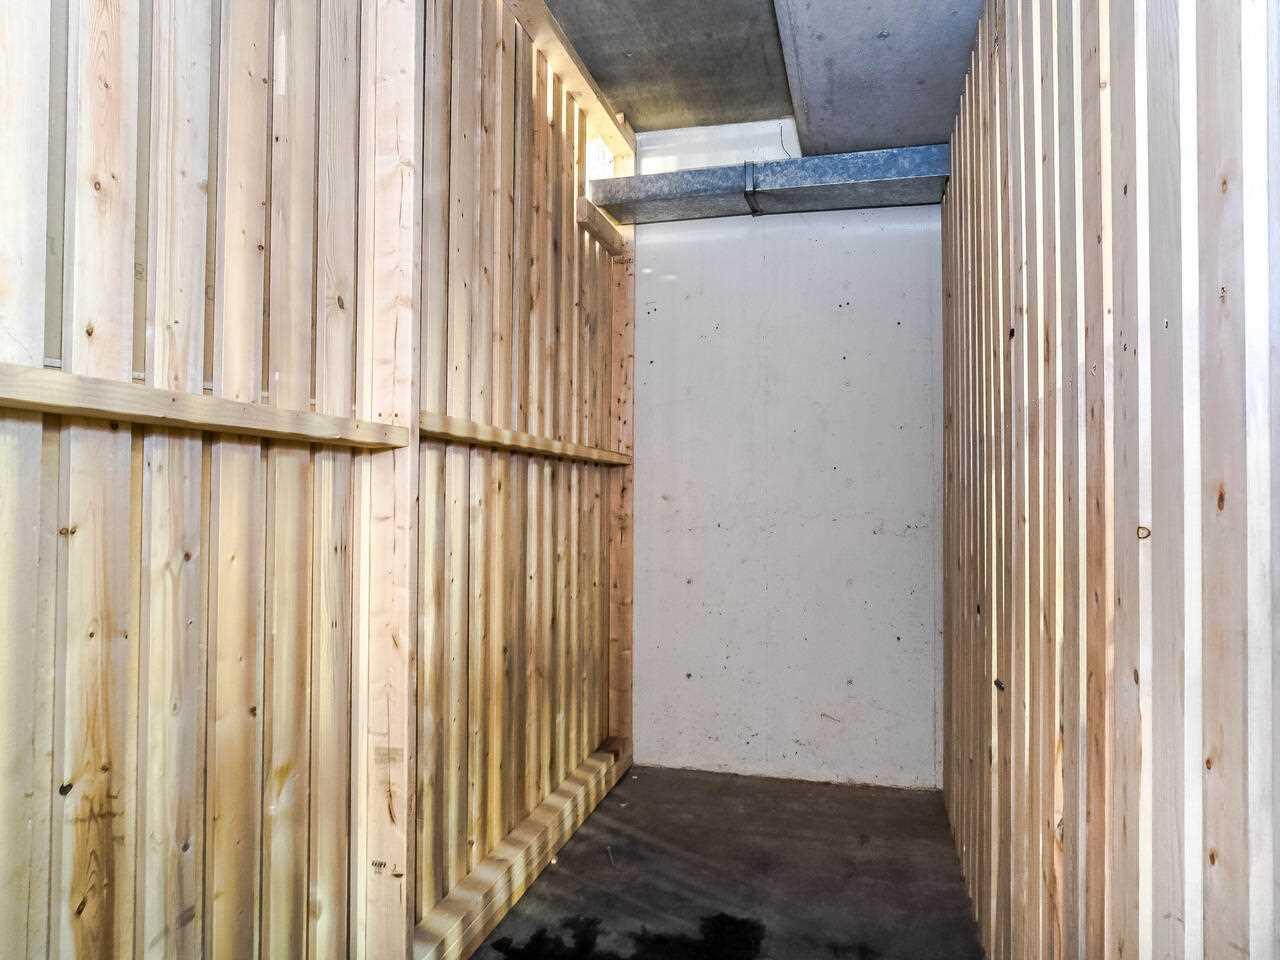 211 3721 DELBROOK AVENUE - Upper Delbrook Apartment/Condo for sale, 1 Bedroom (R2502345) - #20